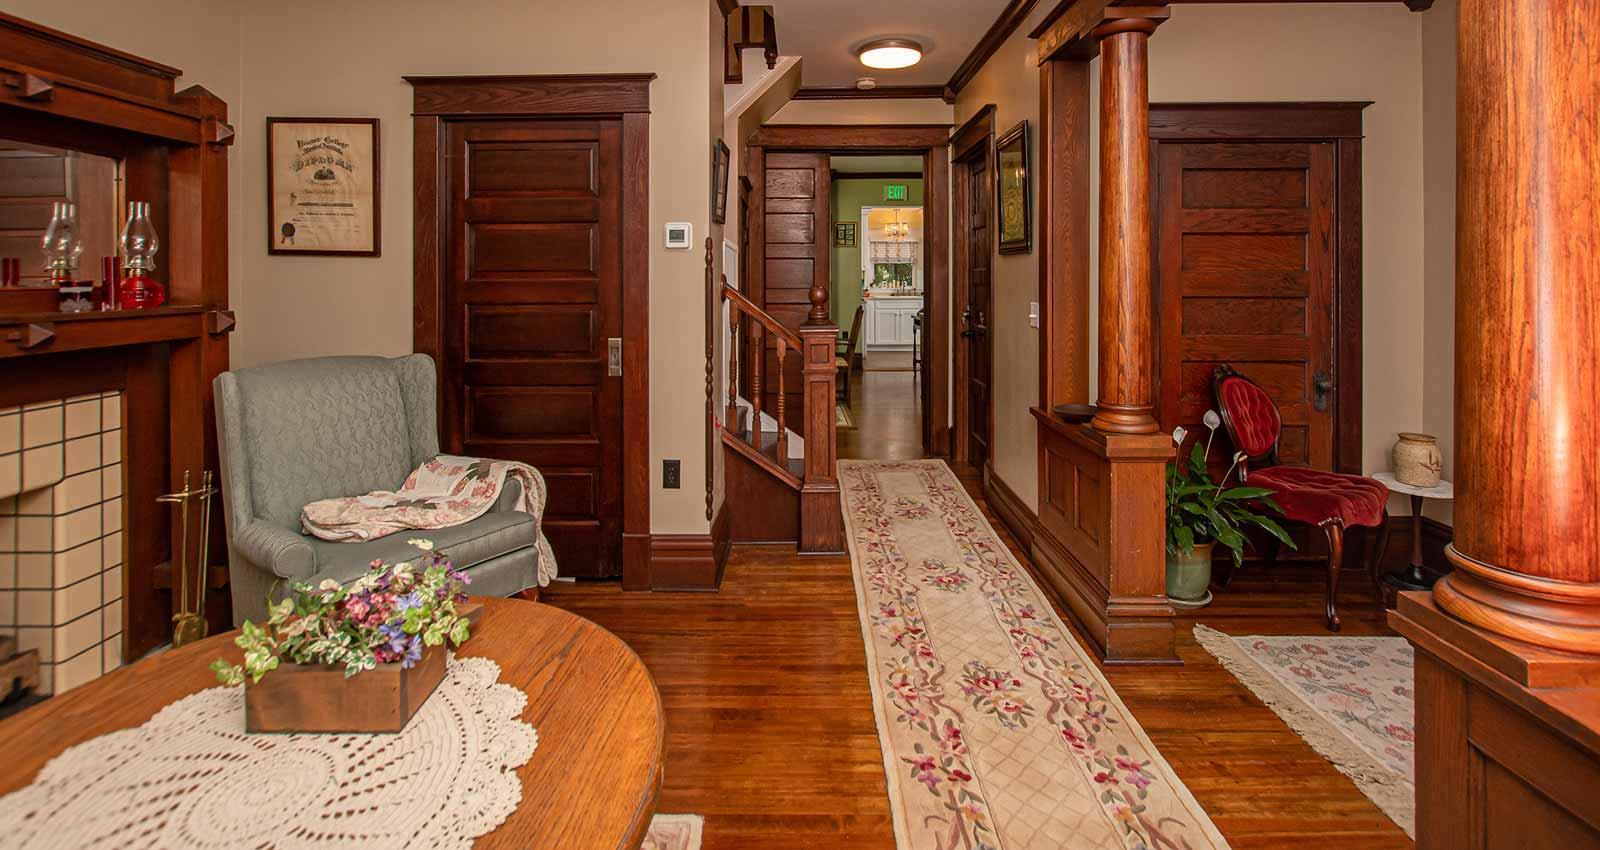 Riverside Bed & Breakfast Entry Hall